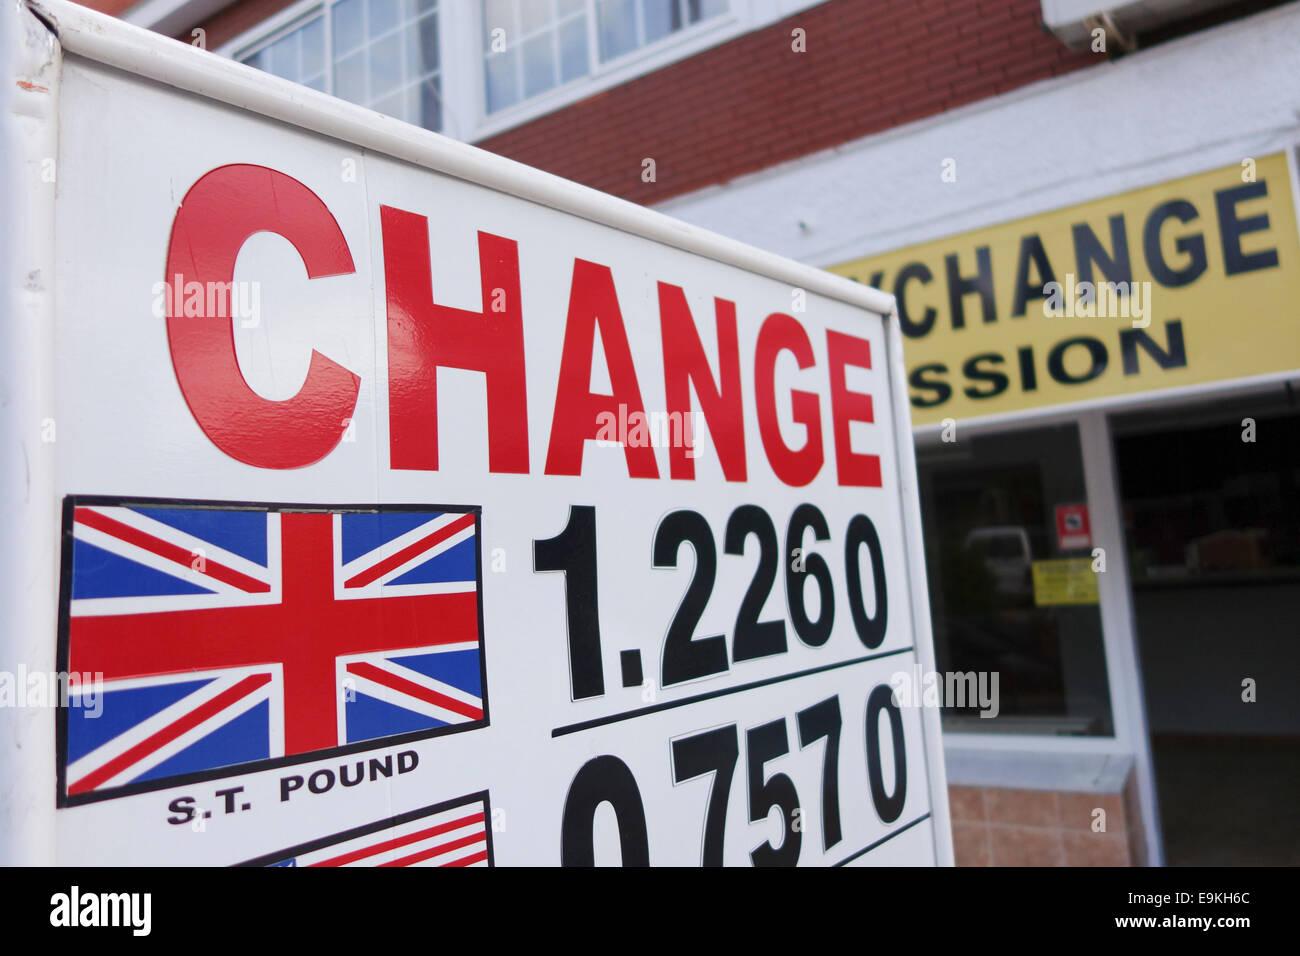 Ufficio Cambio Valuta A Roma Moneta A Cuba 2019 Cambio Cuc Euro